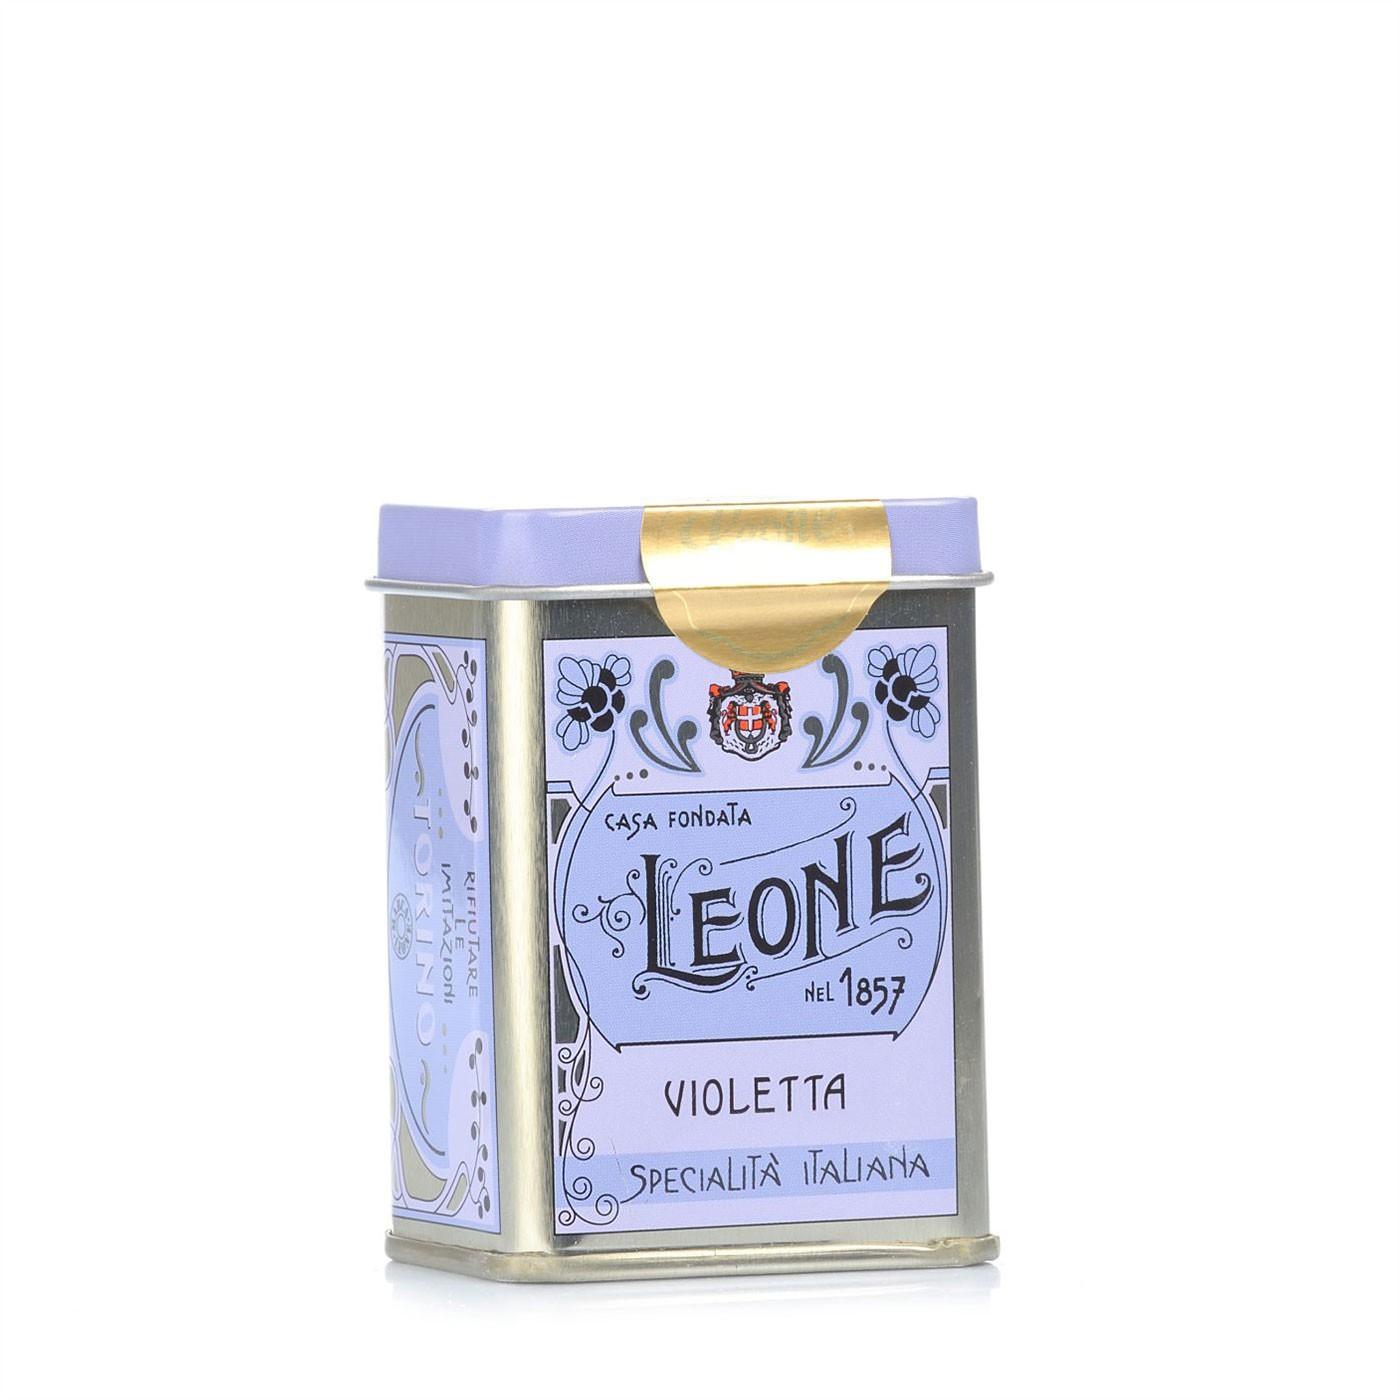 Violet Candies Tin 1.5 oz